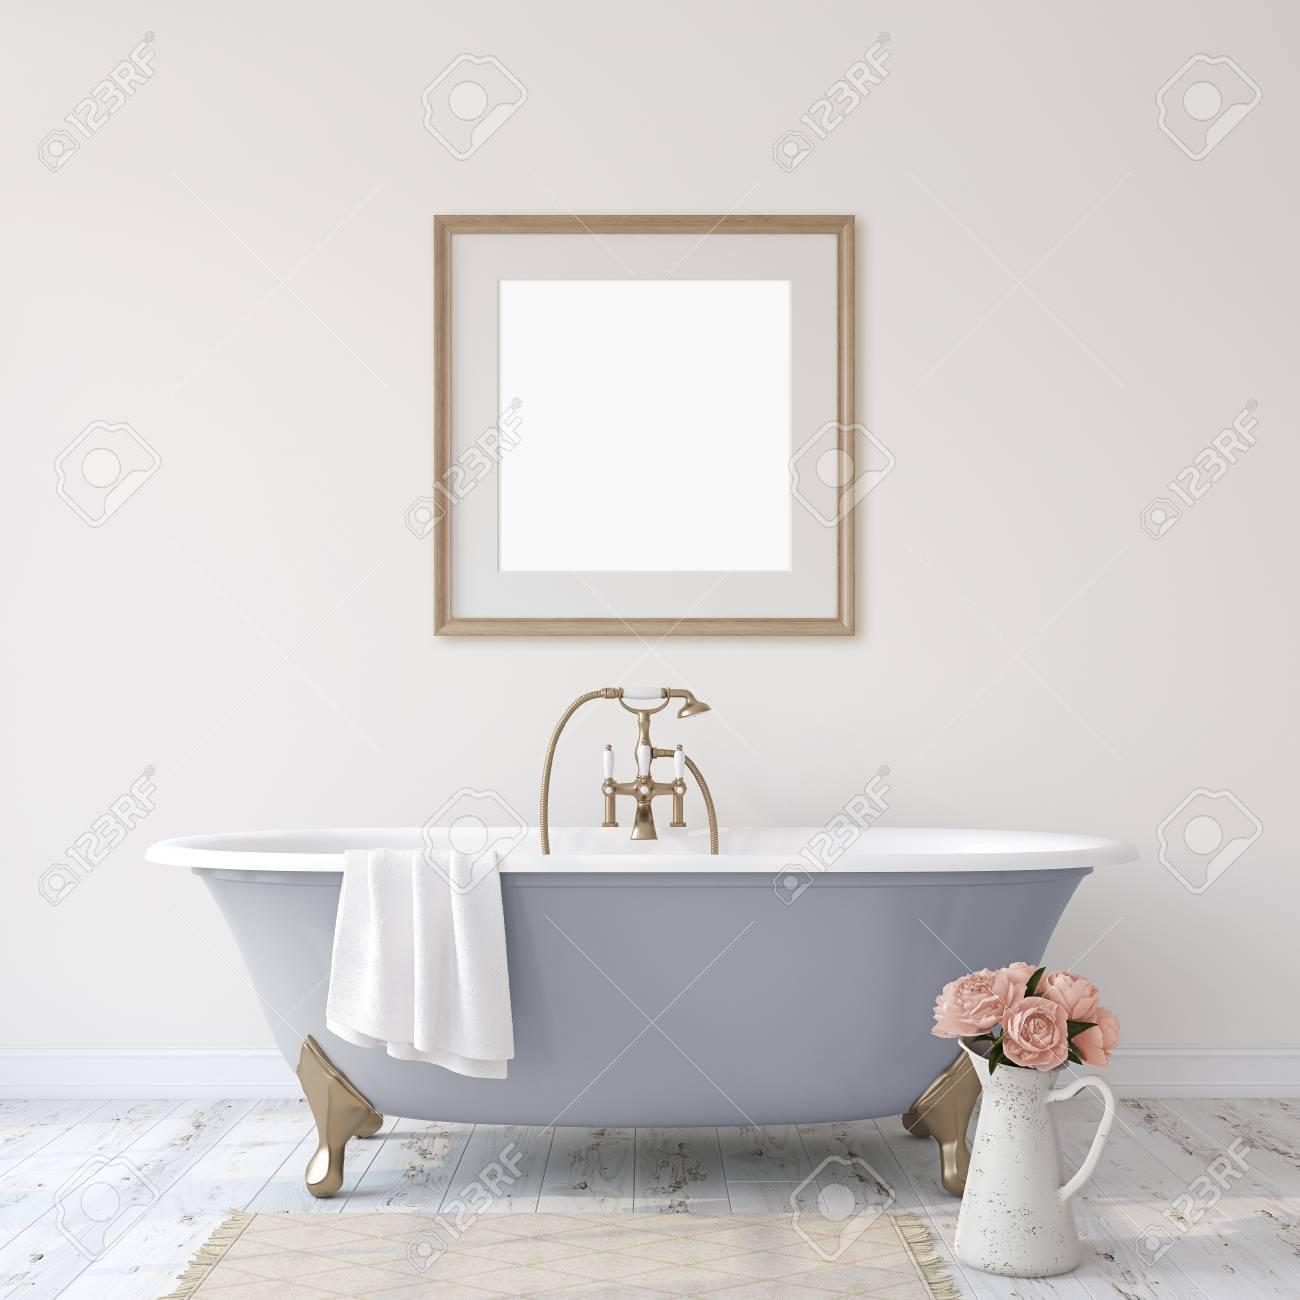 Romance bathroom. Interior and frame mock-up. 3d render. - 118411775